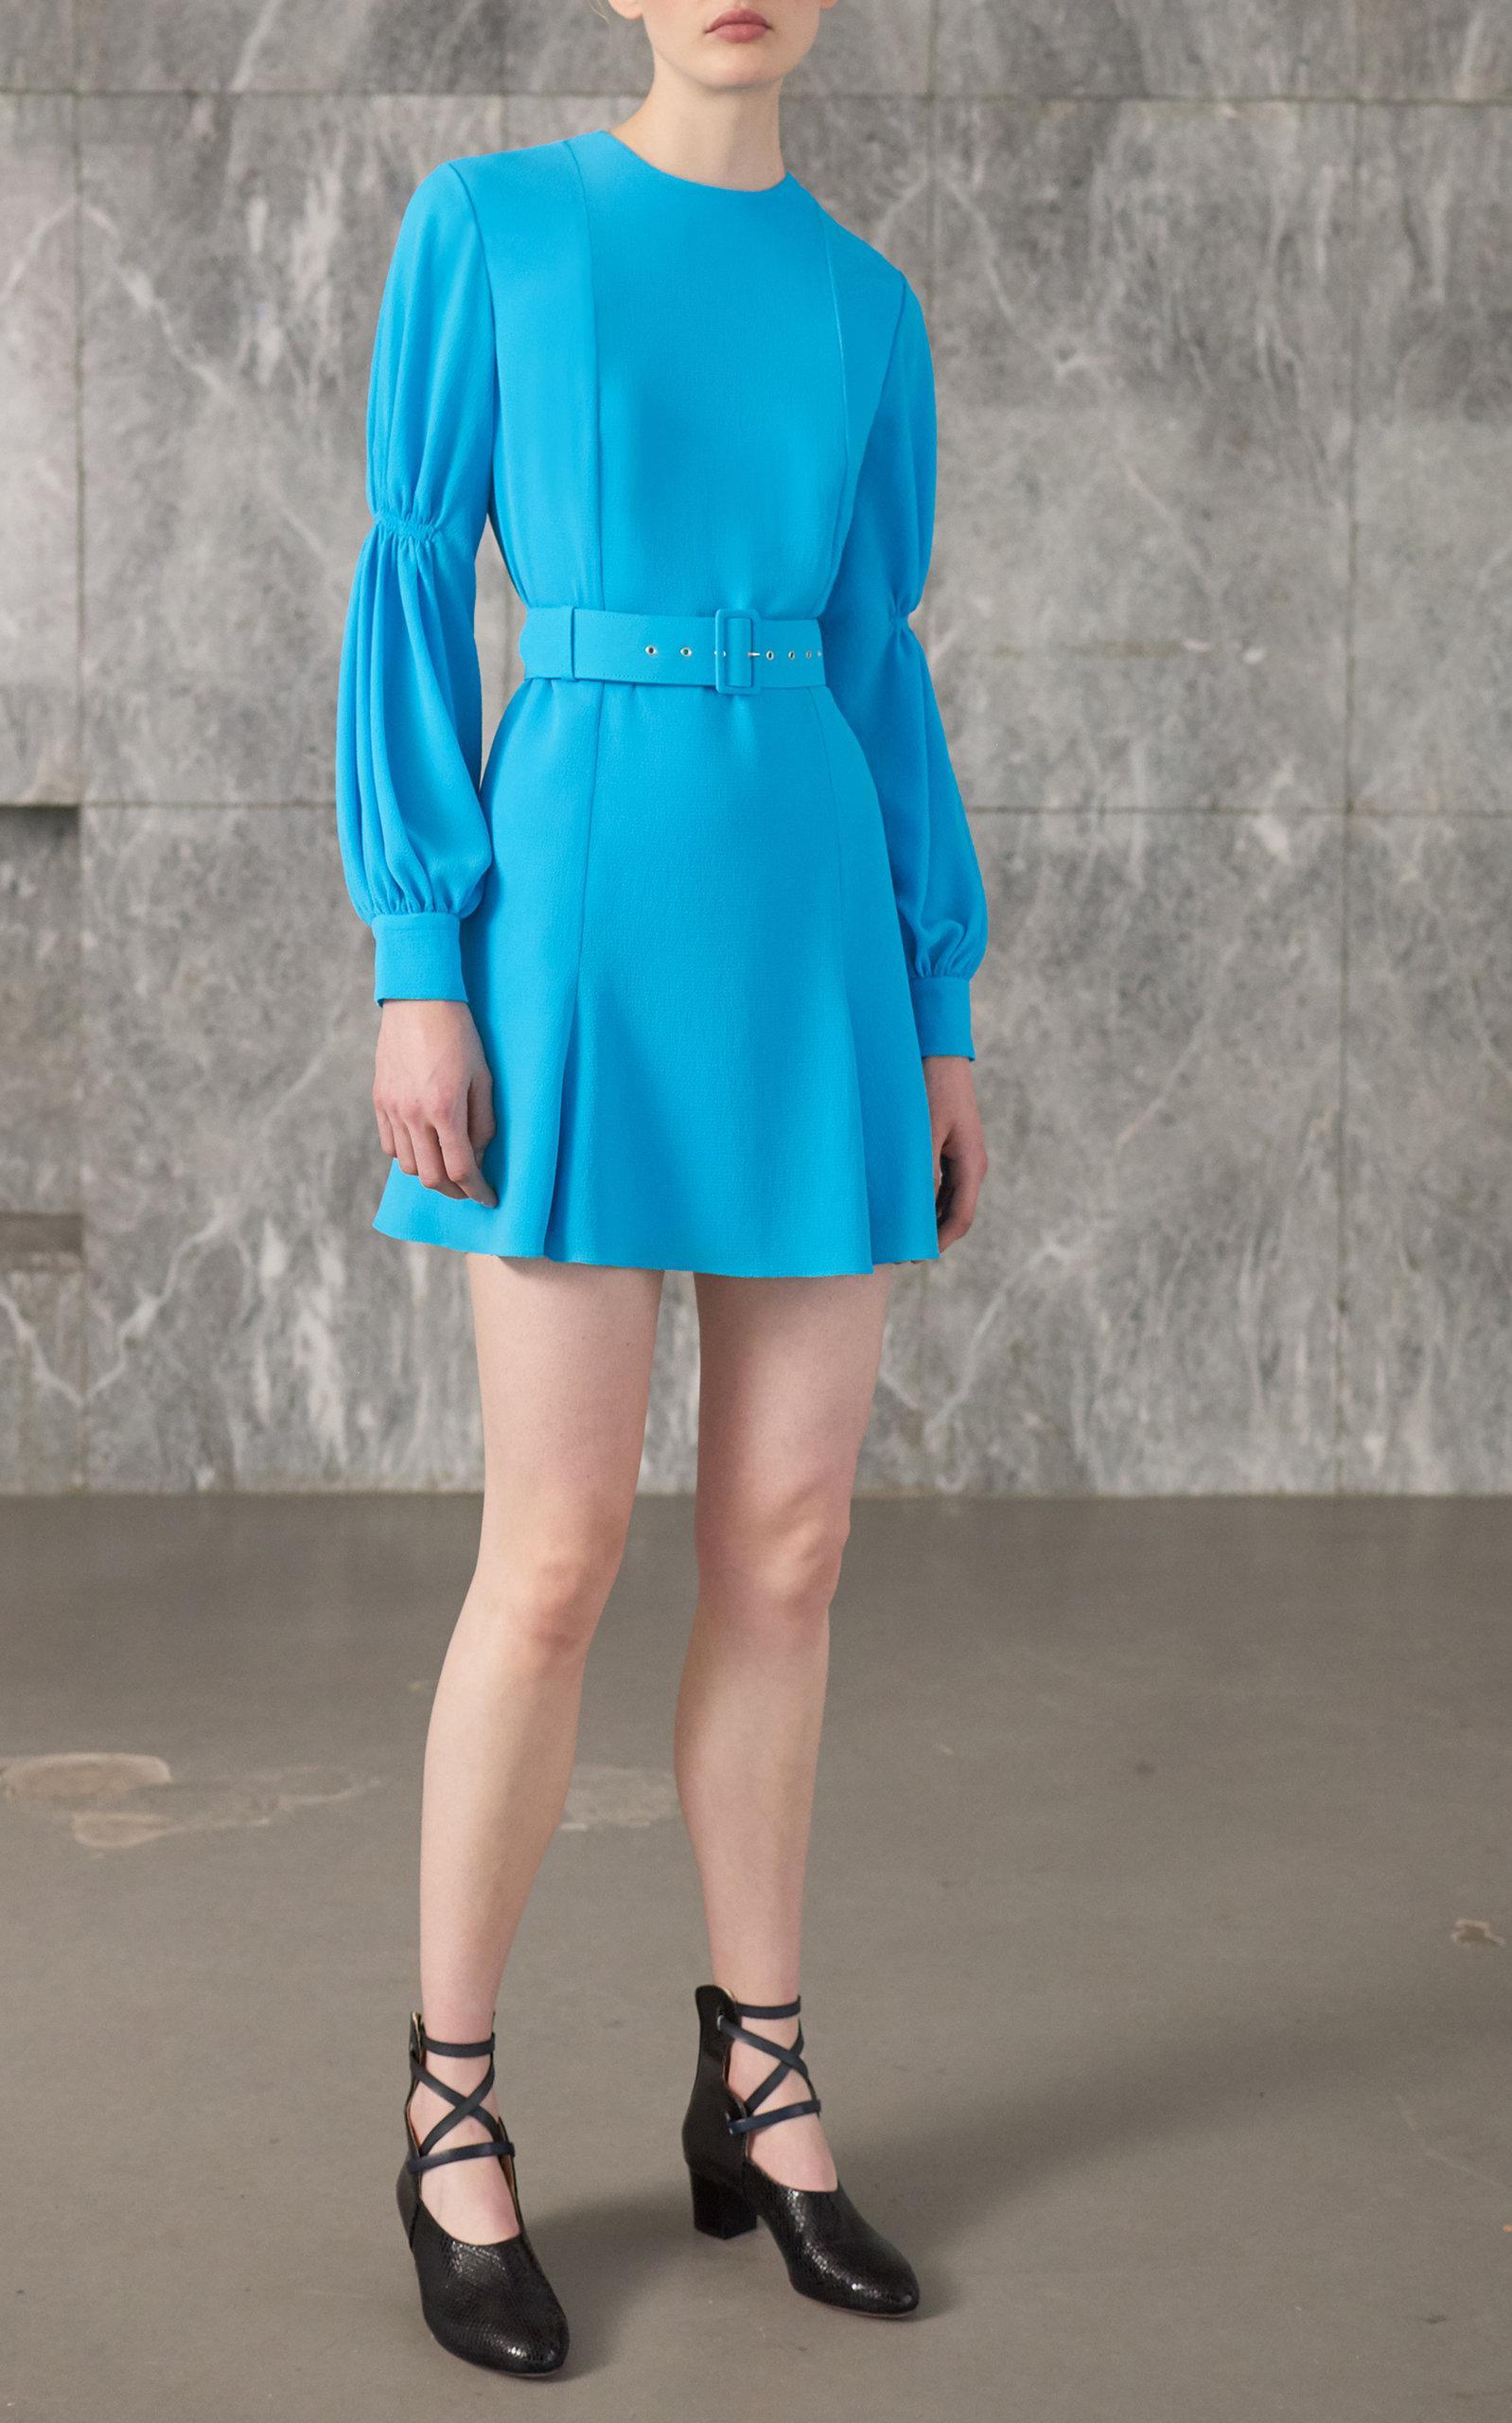 Philippa Long-Sleeve Mini Dress in blue